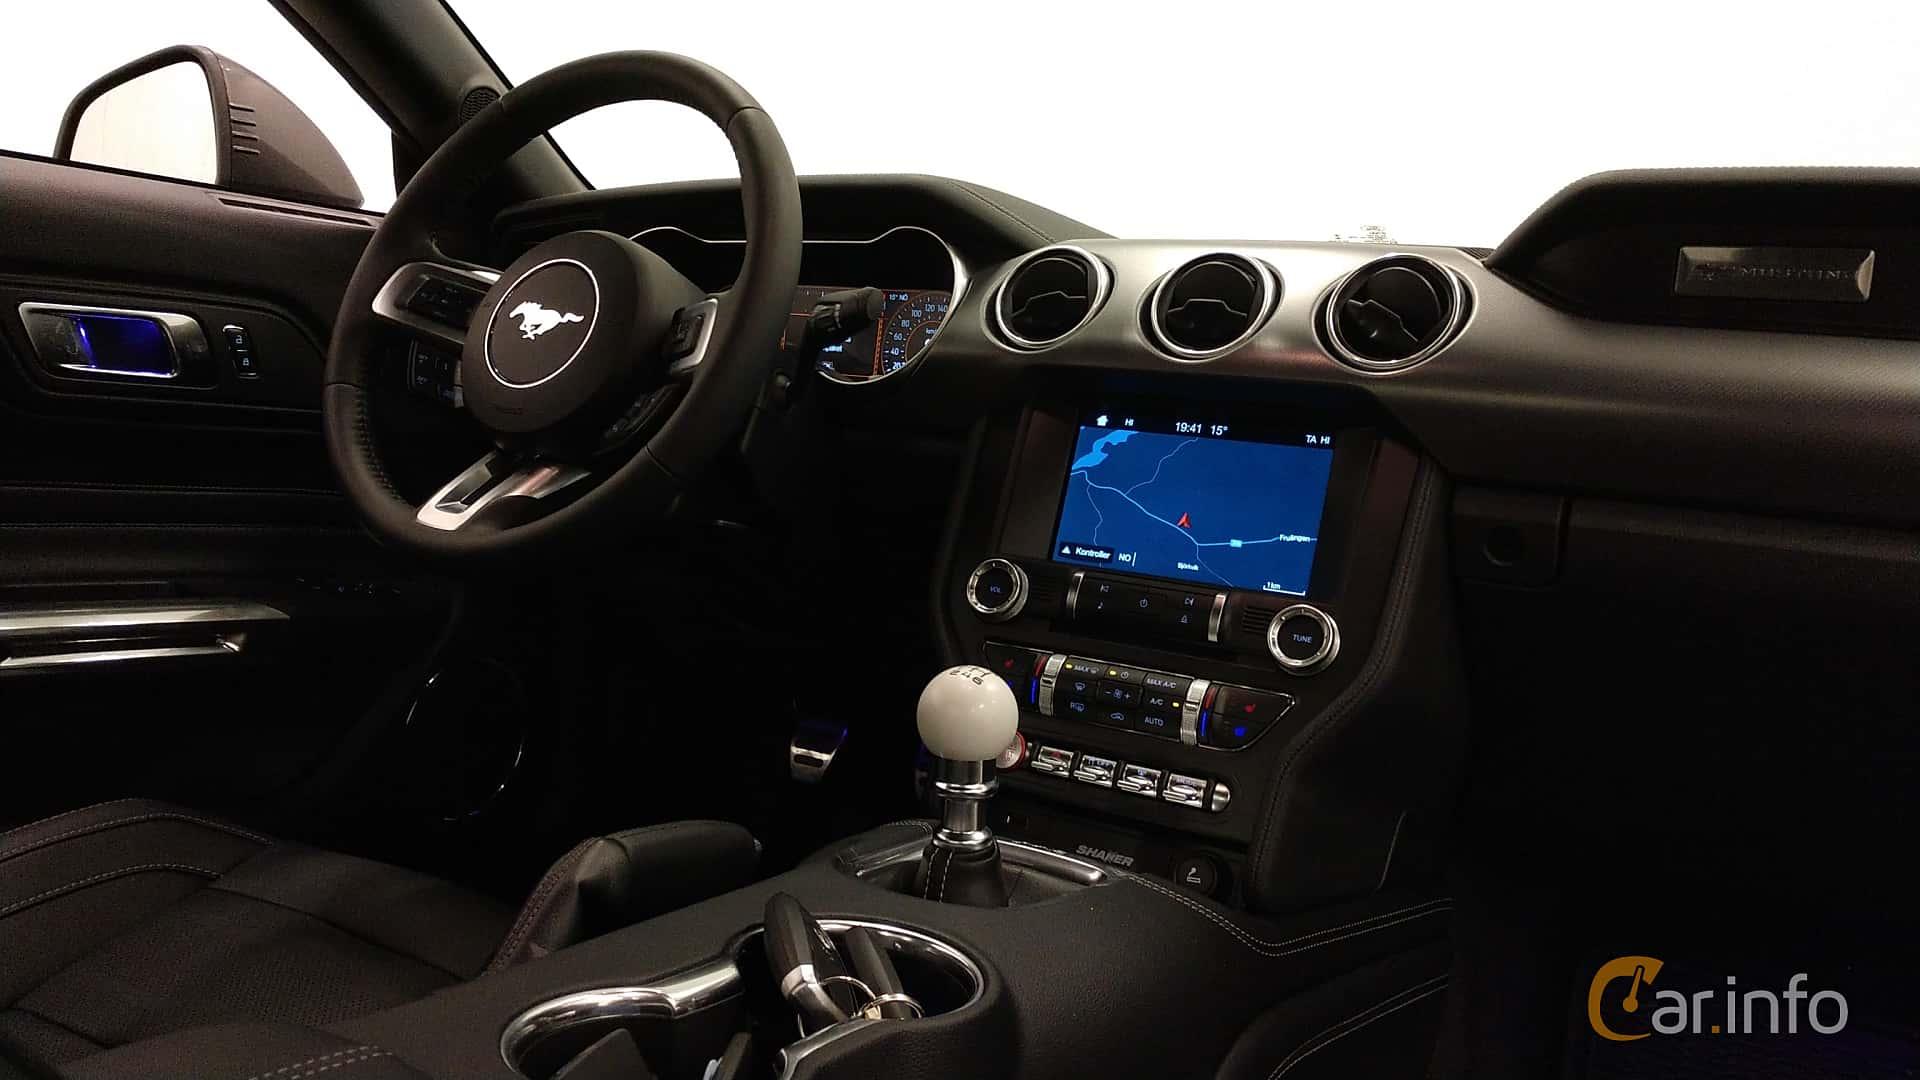 Ford Mustang GT 5.0 V8 Manual, 450hp, 2018